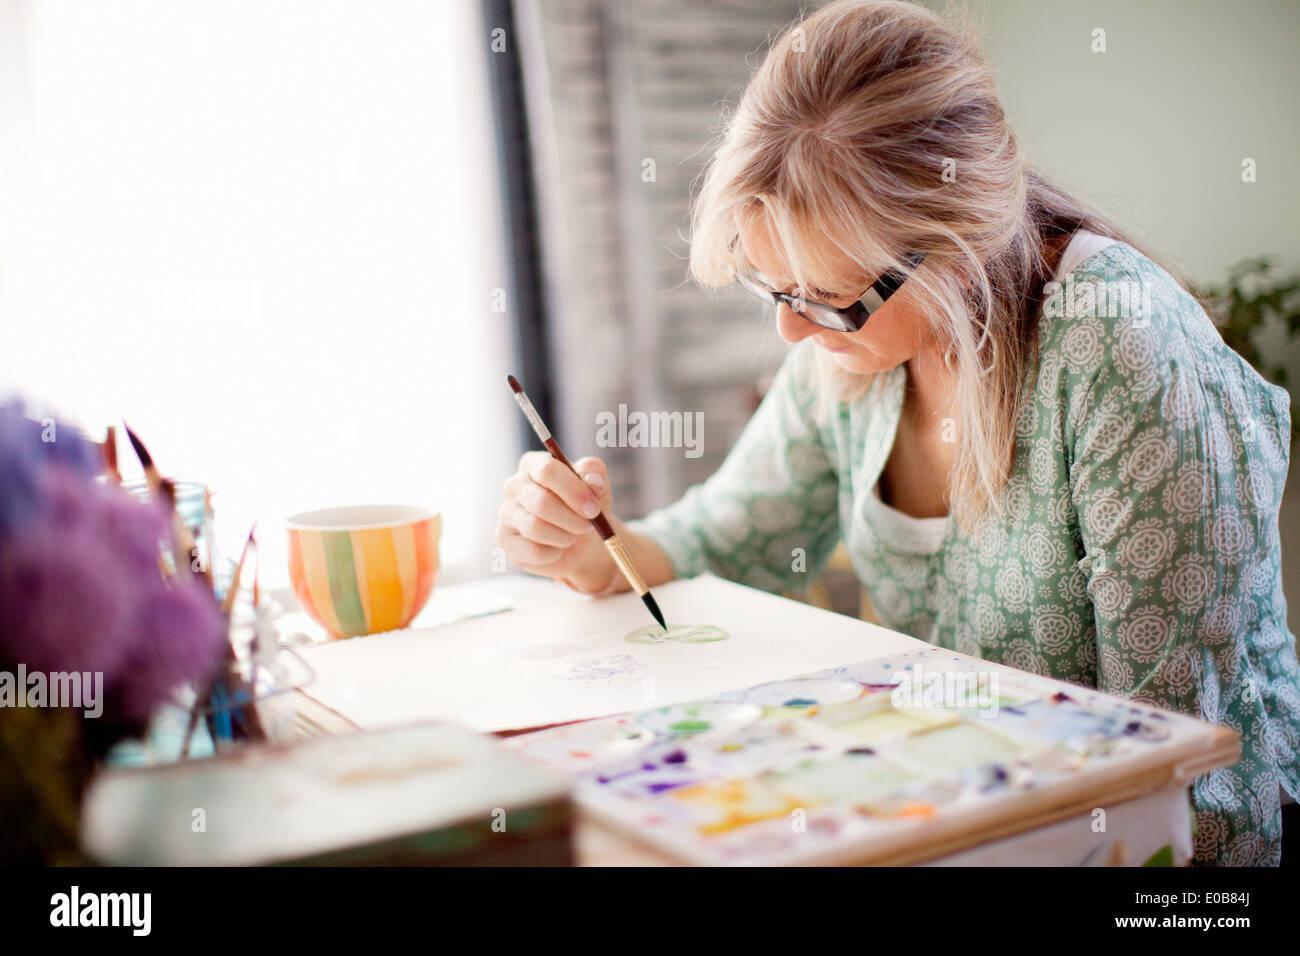 Hembra madura artista pintura acuarela en studio Imagen De Stock